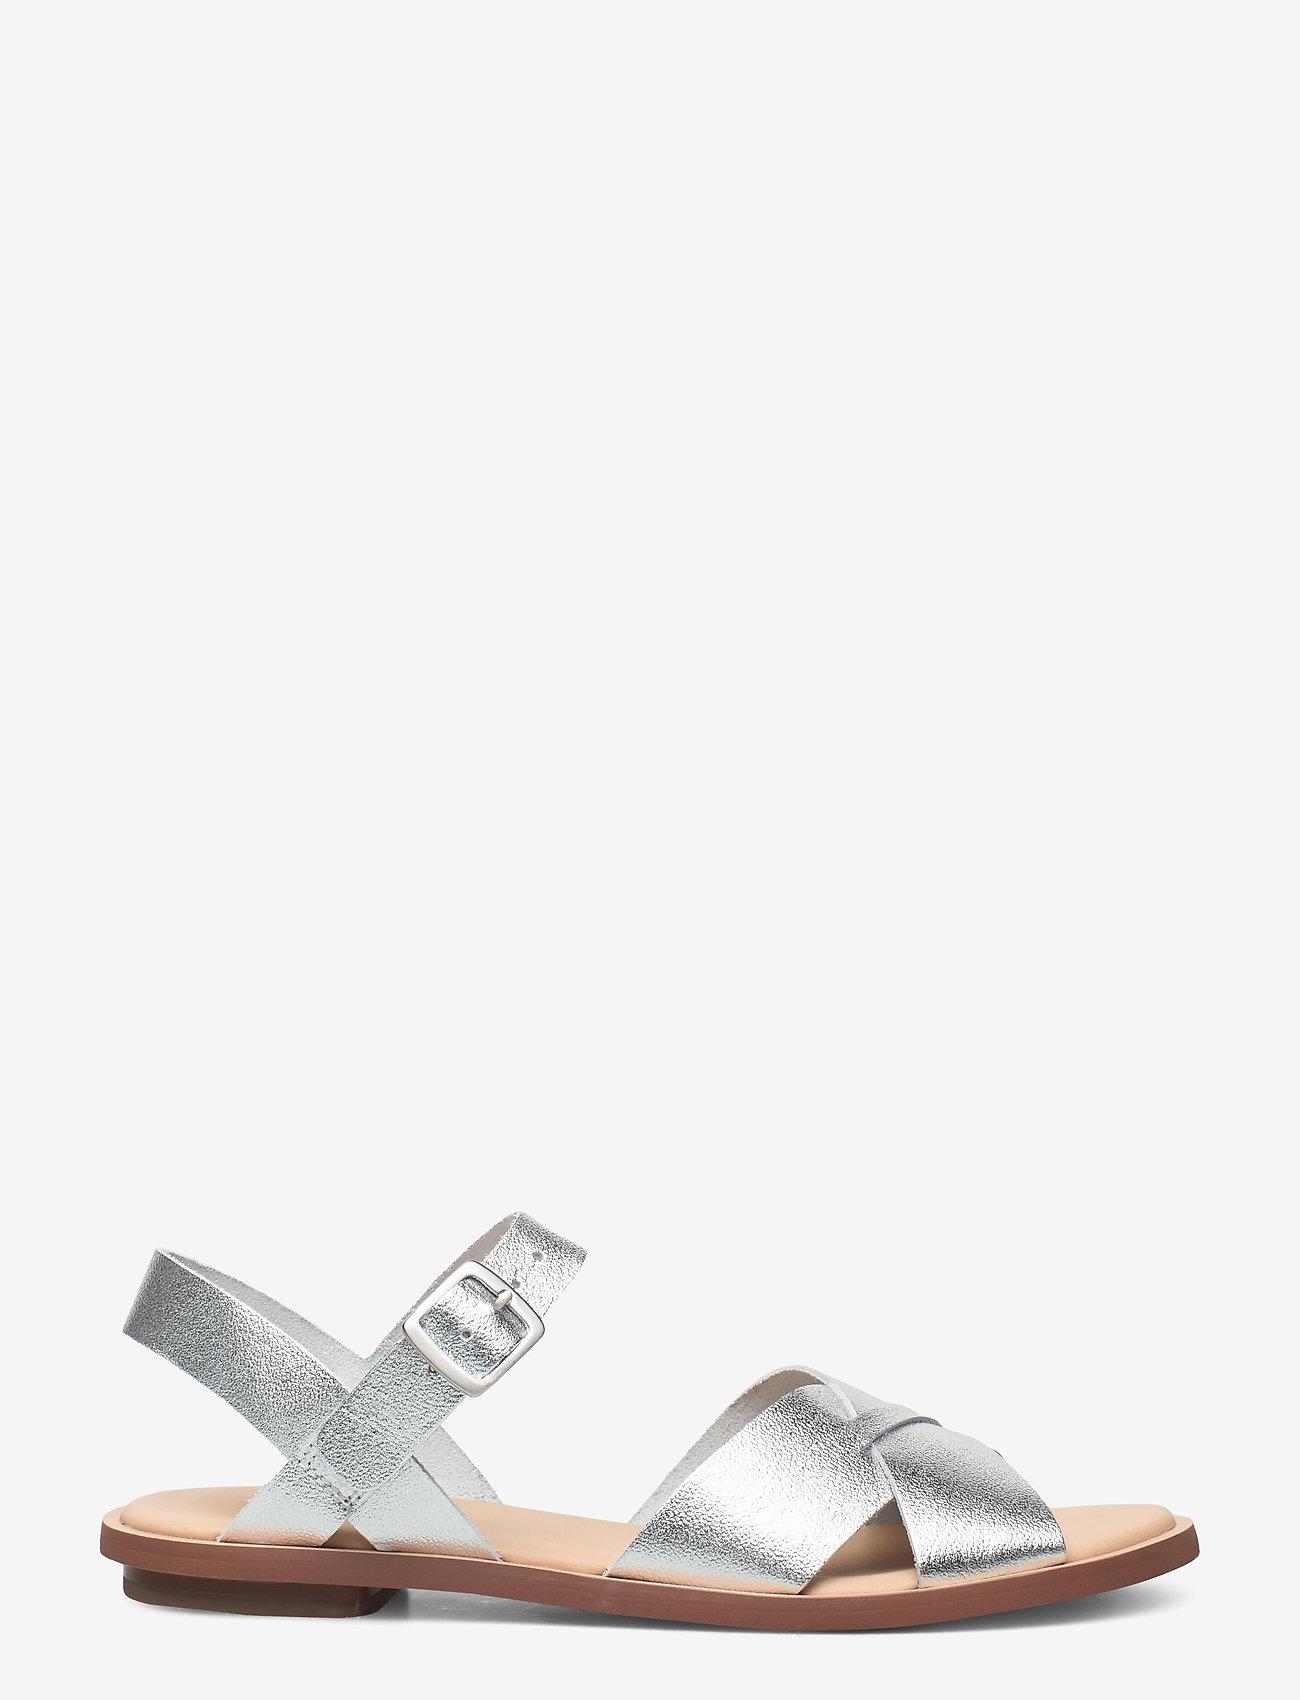 Clarks - Willow Gild - platta sandaler - silver metallic - 1